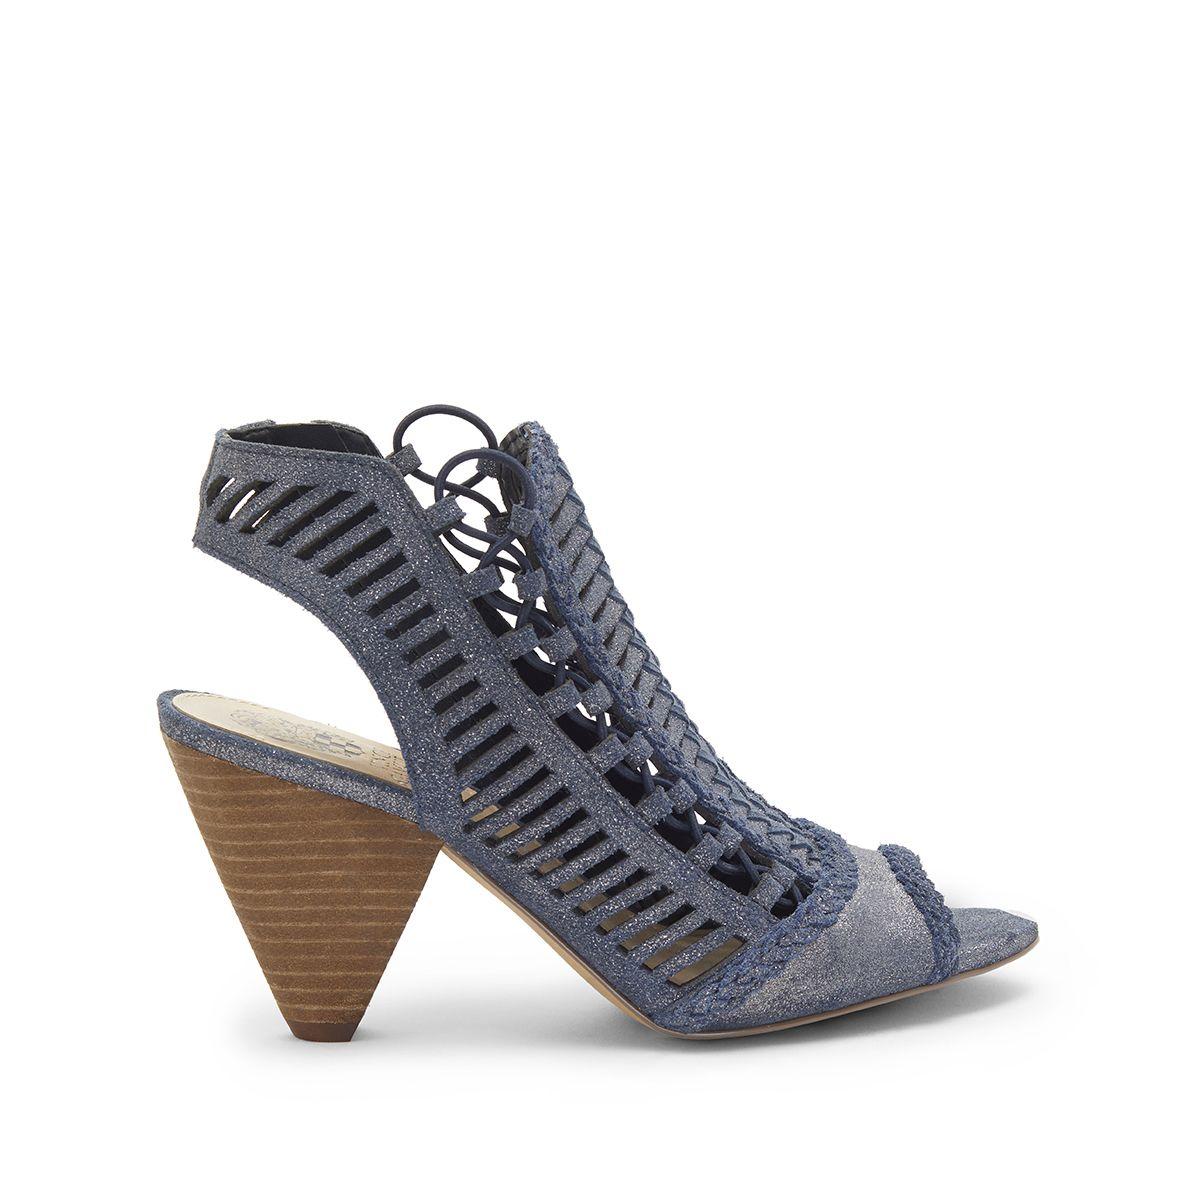 6484df4dc80 Vince Camuto Shoes - Macy s